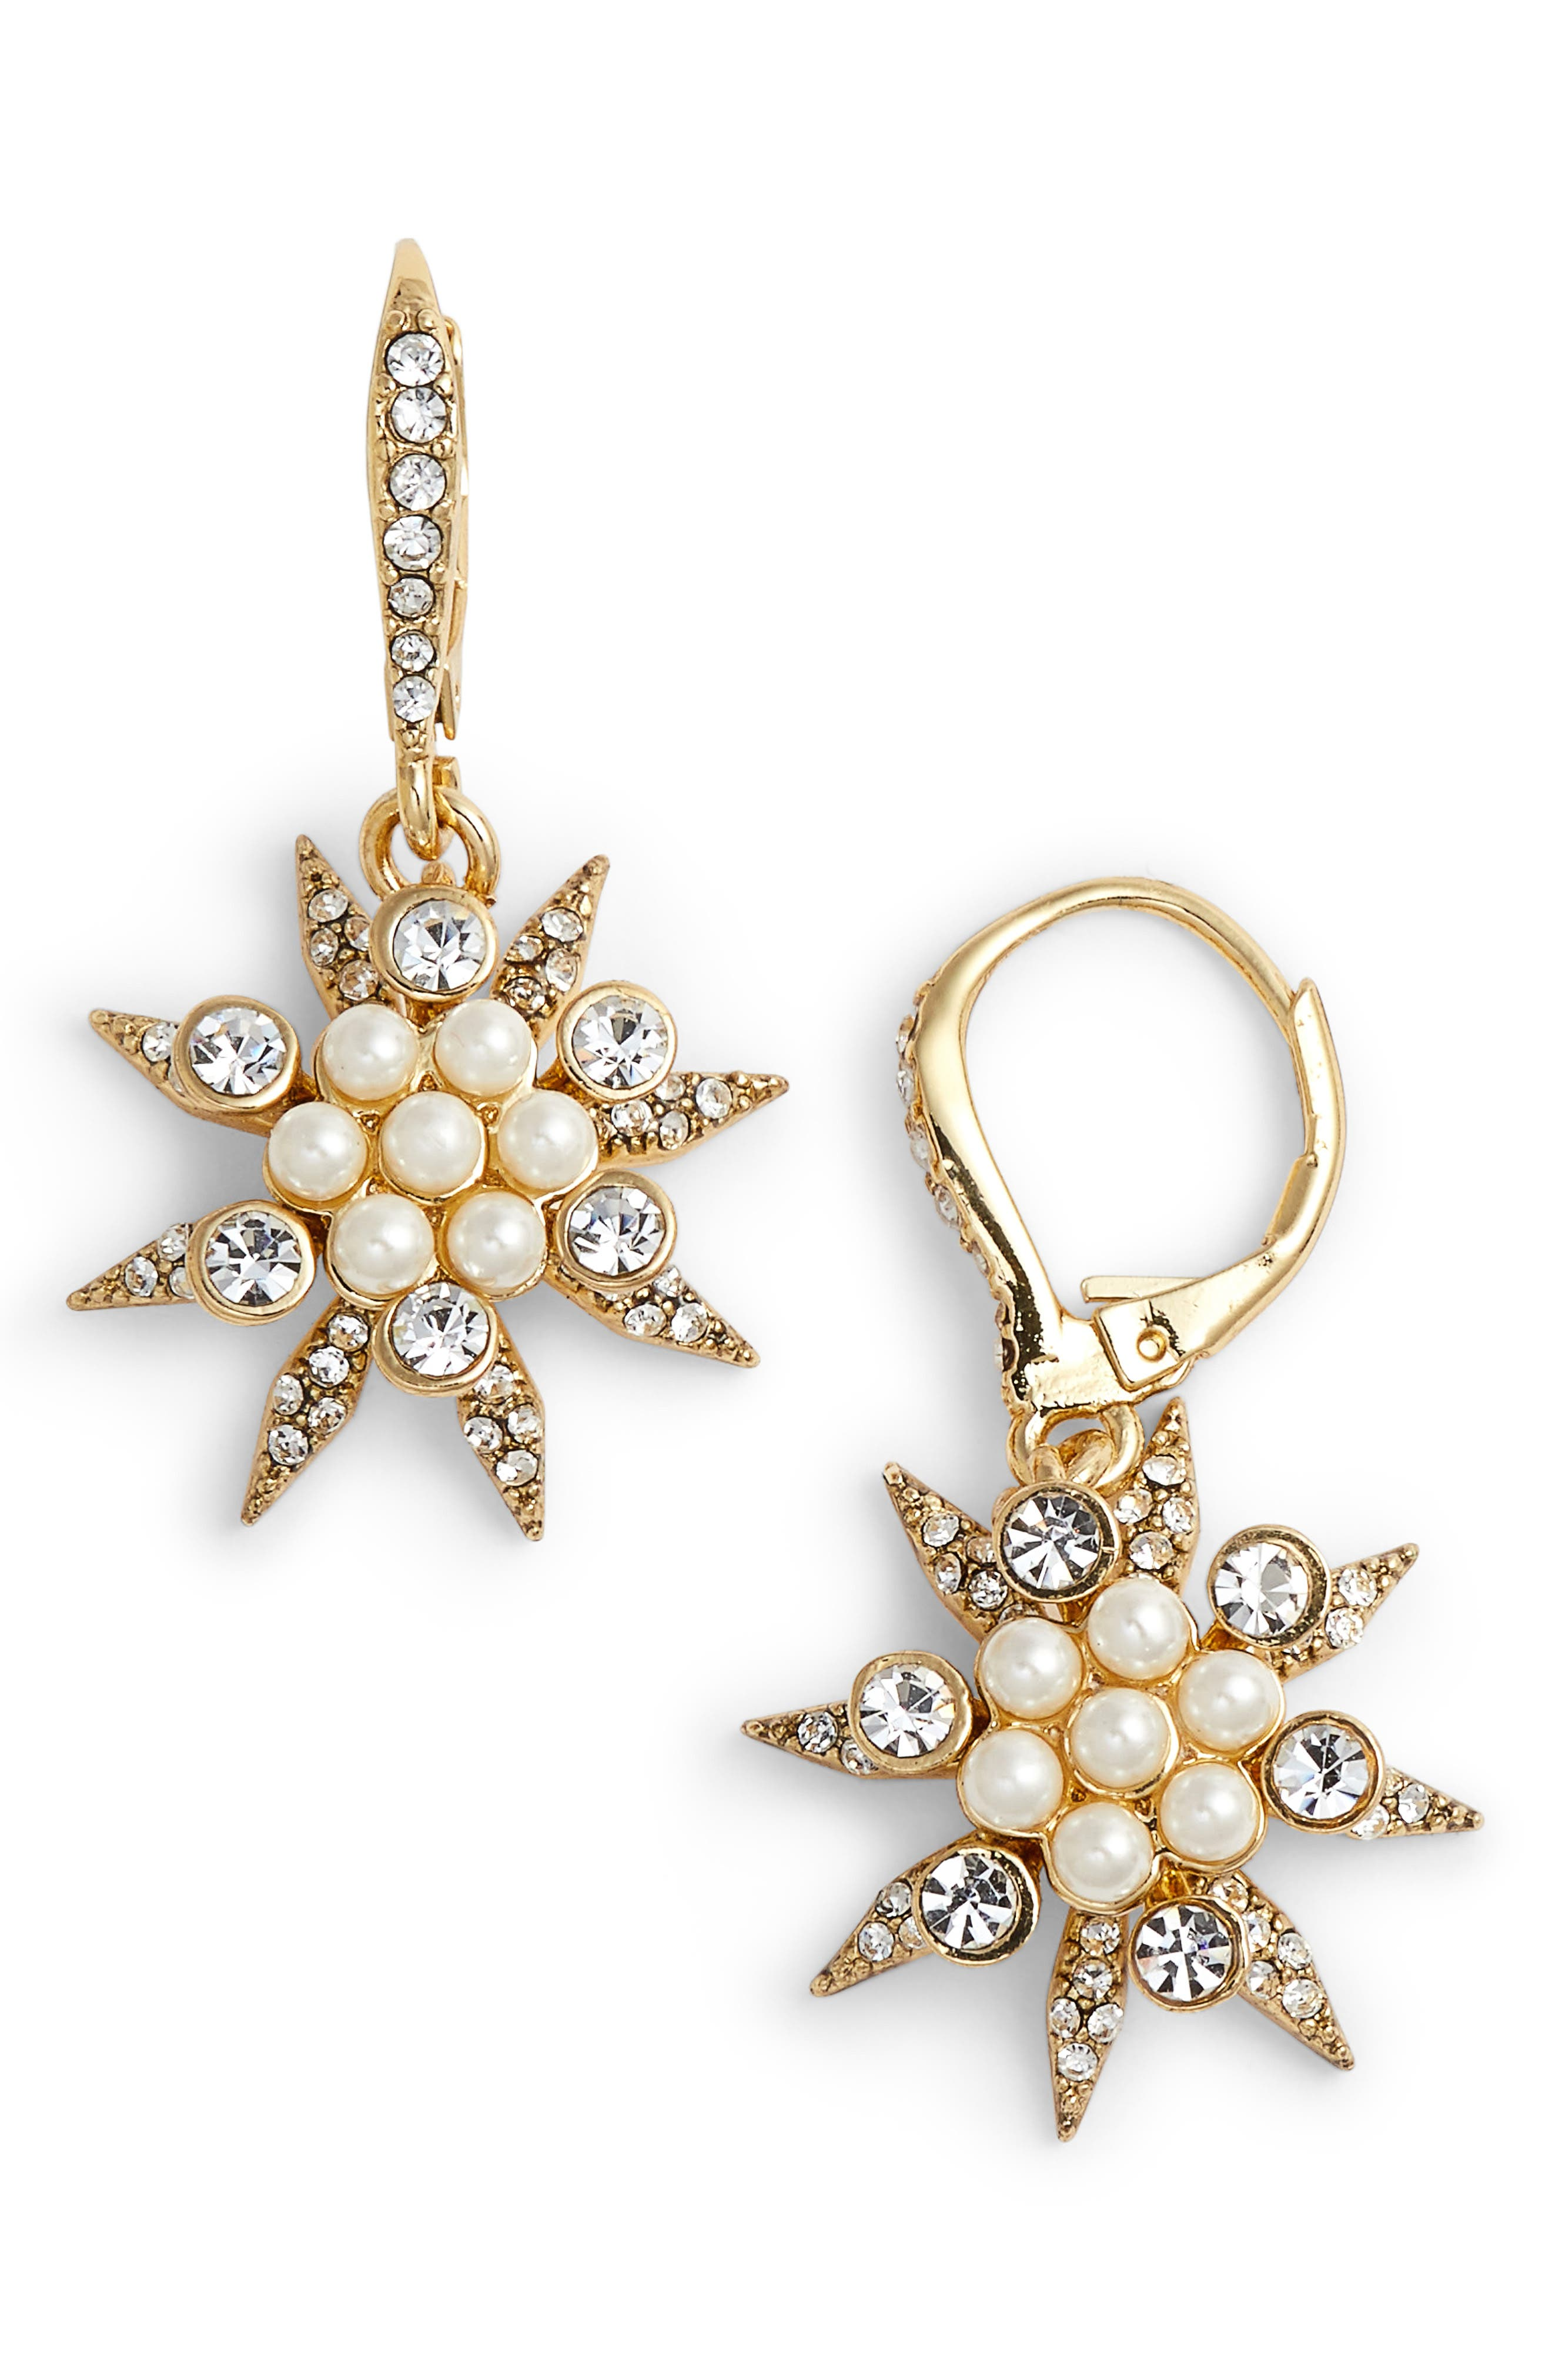 Main Image - Jenny Packham Star Cluster Drop Earrings